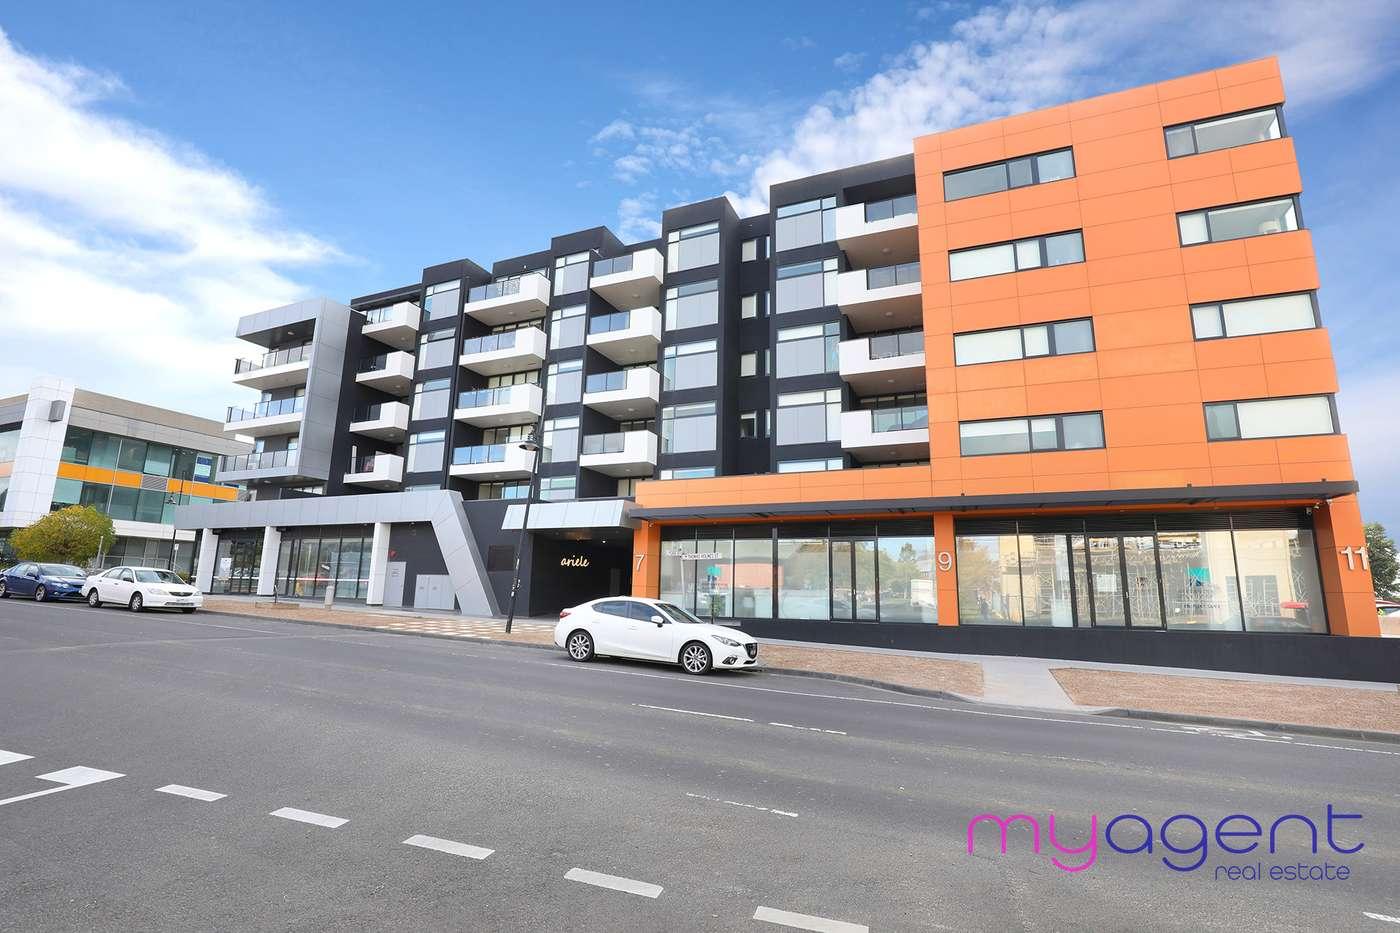 Main view of Homely apartment listing, 409/7 Thomas Holmes Street, Maribyrnong, VIC 3032